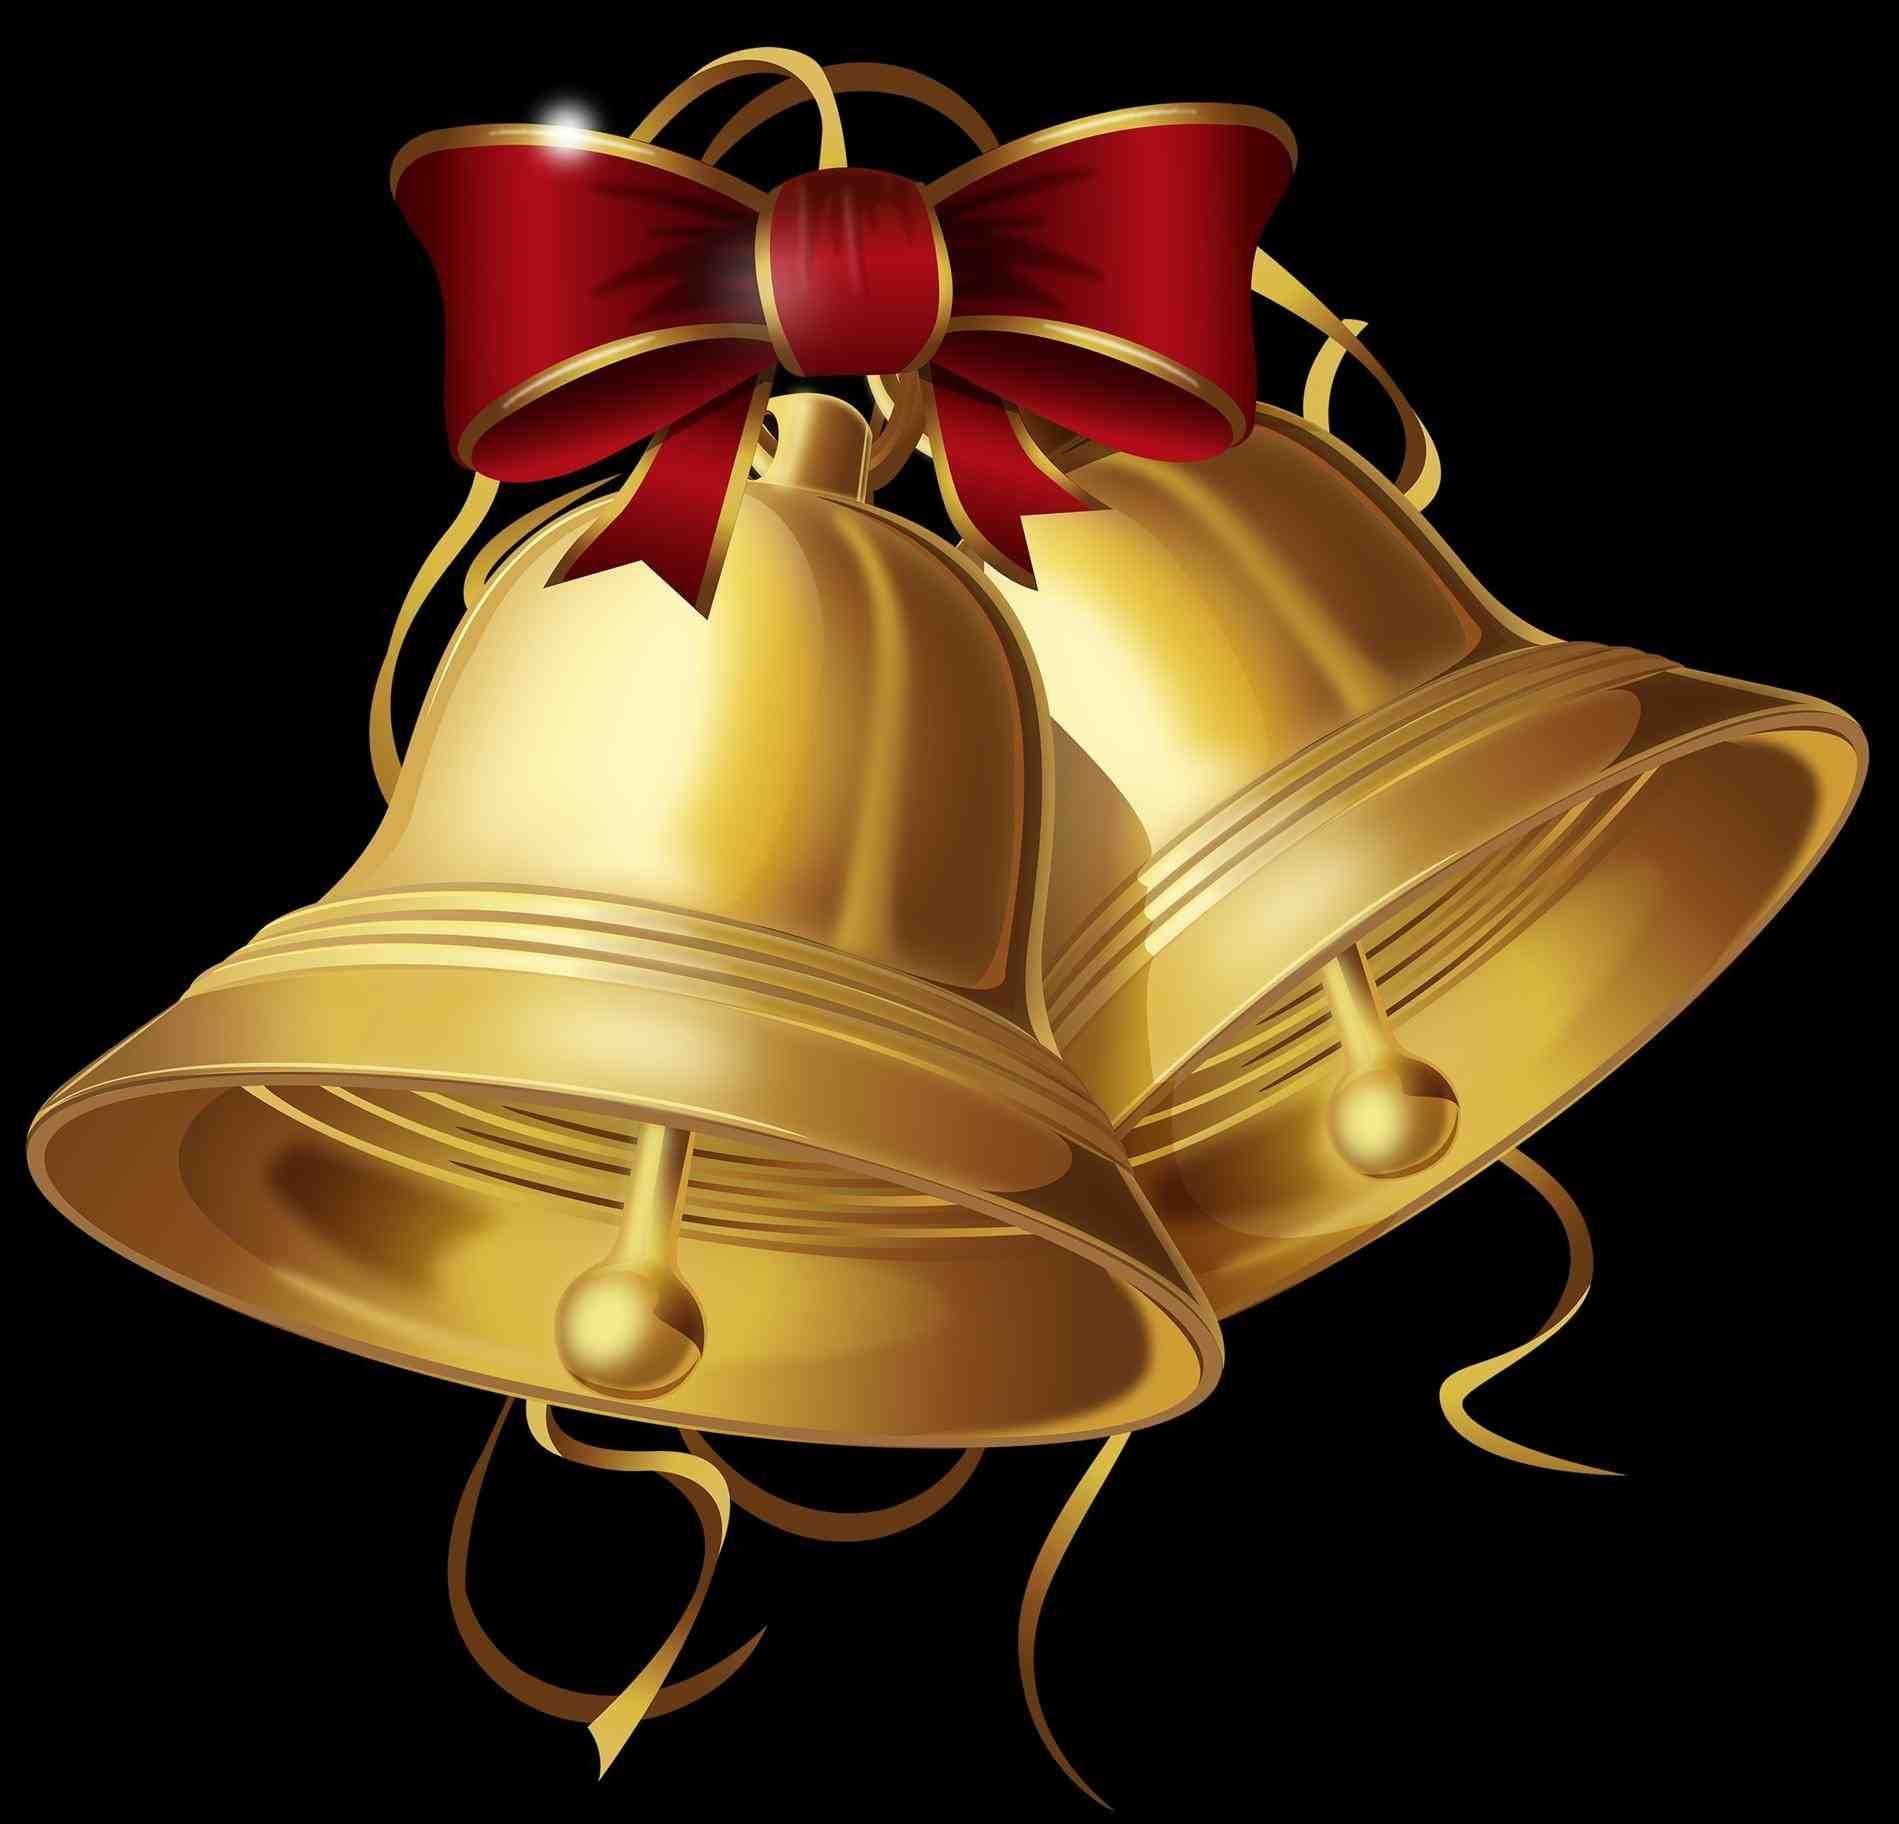 Xmast Site Christmas Bells Christmas Bells Drawing Bells